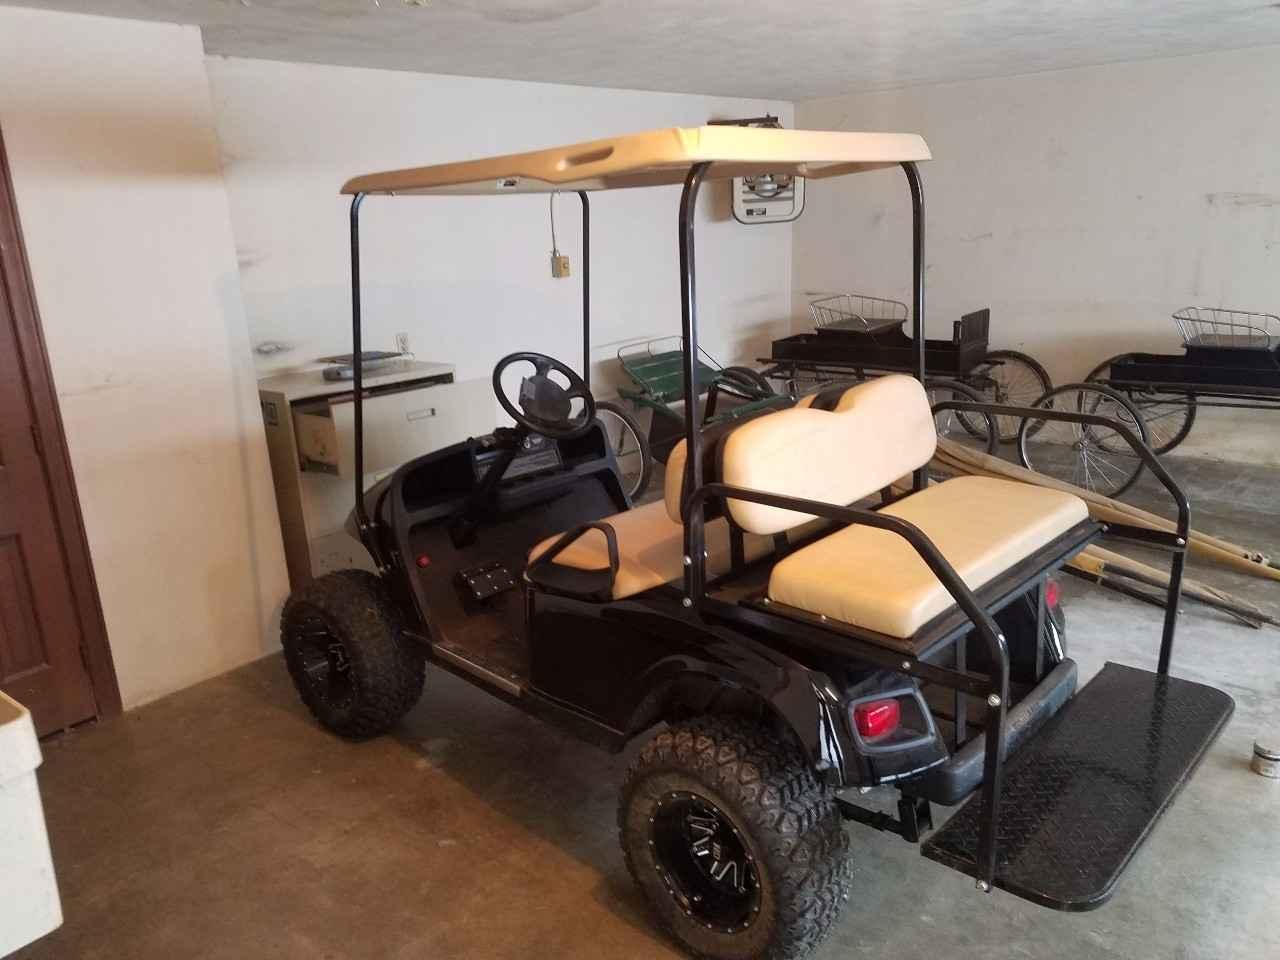 yamaha golf carts oklahoma 2005 subaru outback wiring diagram used 2012 e z go cart atvs for sale in ohio on atv trades